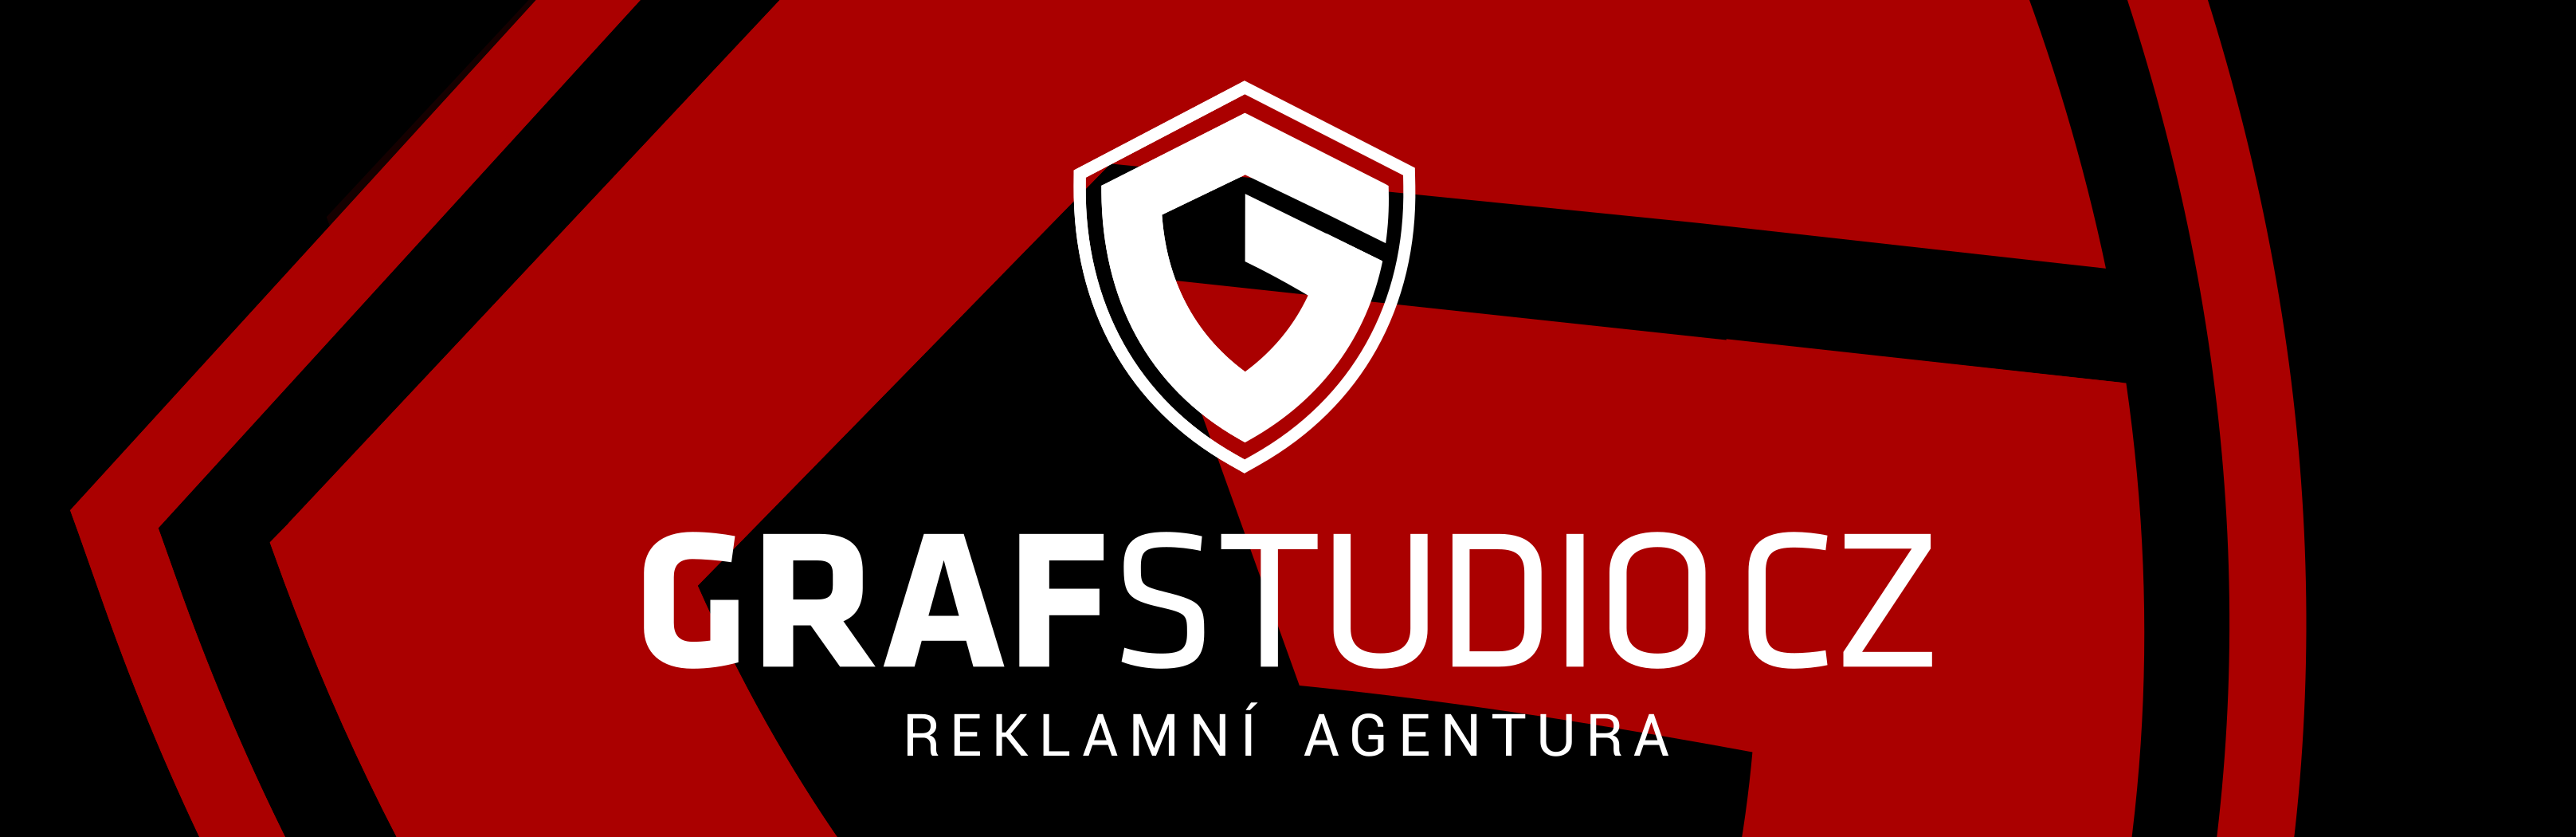 Banner Grafstudio.cz reklamní agentura